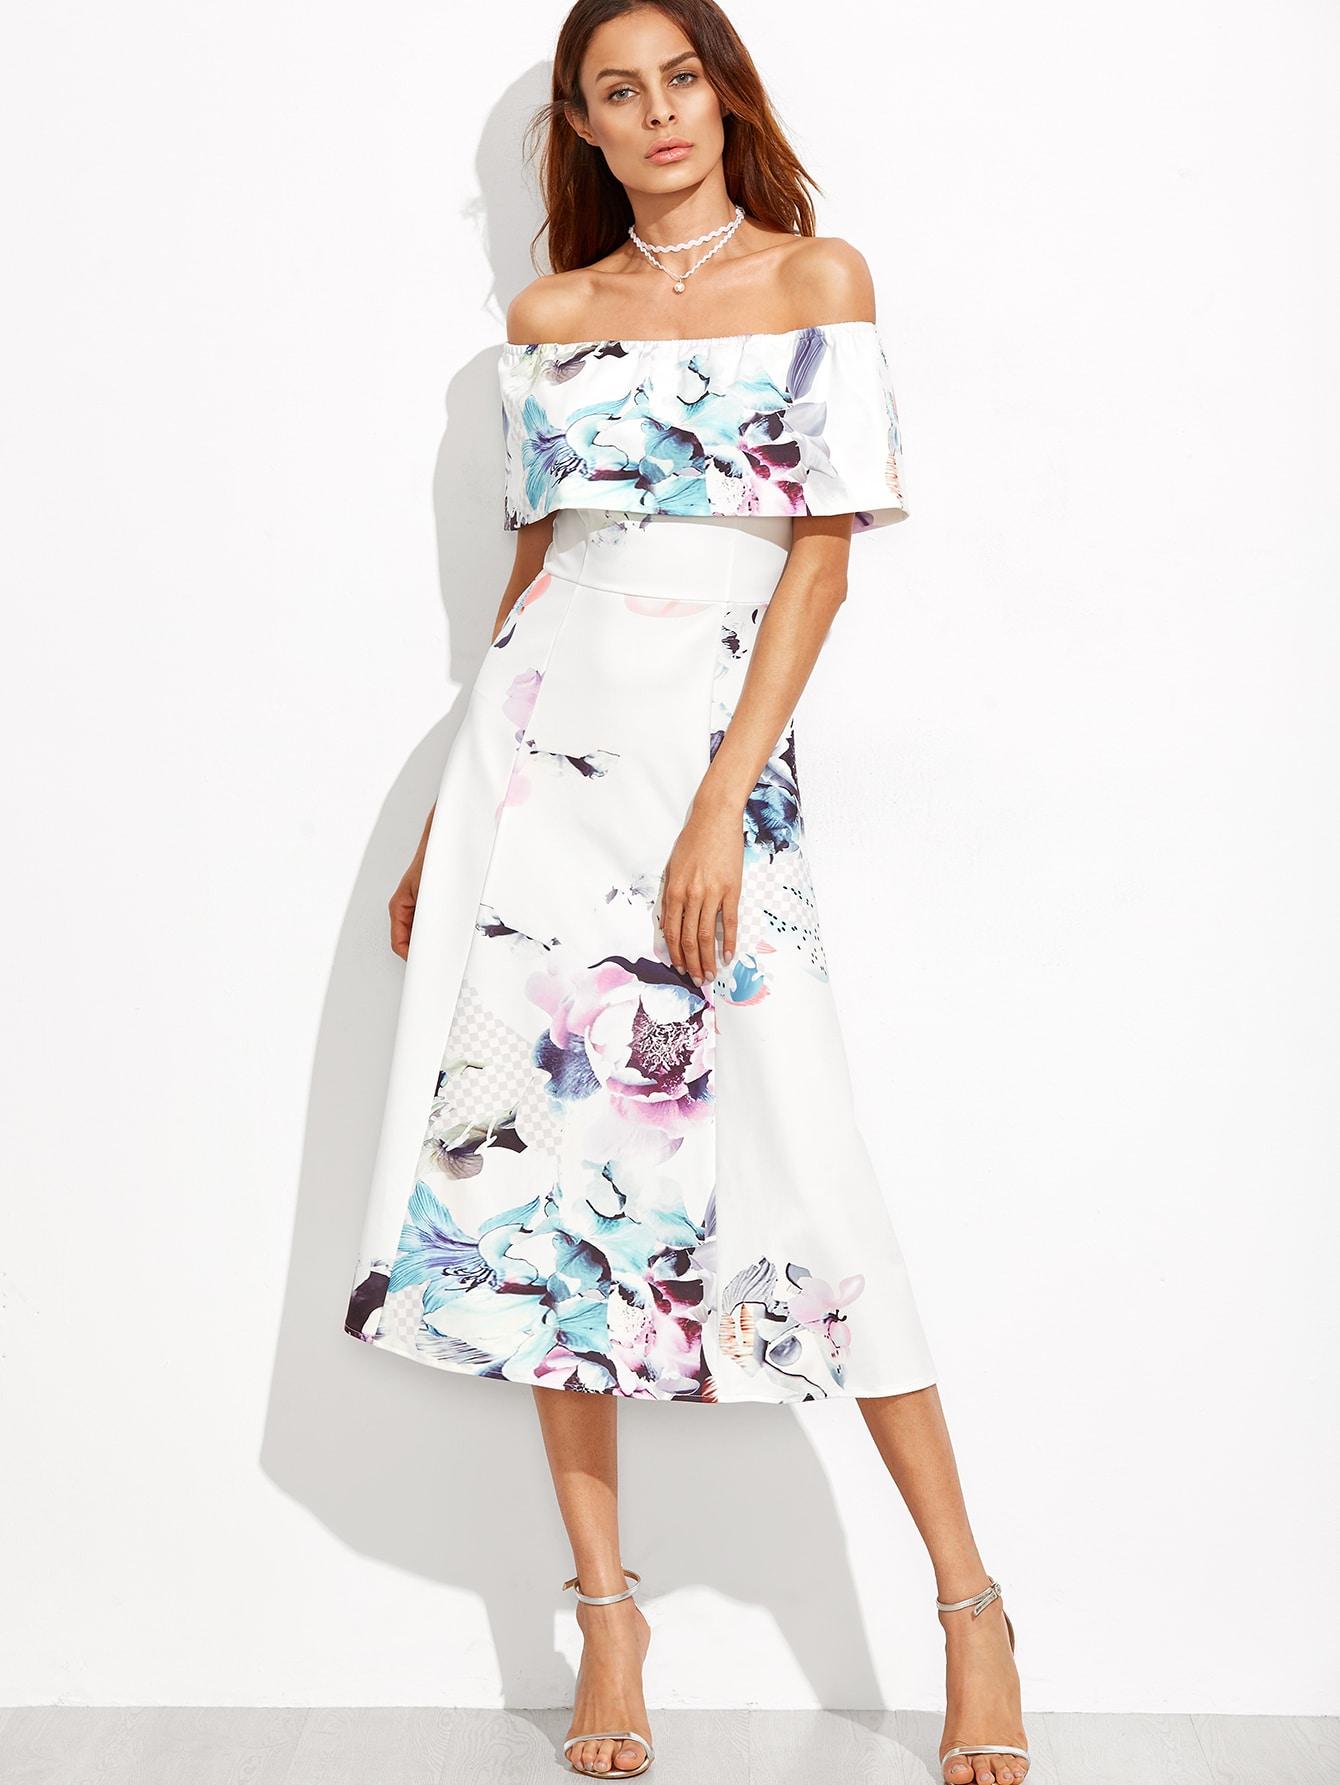 7307b5b9f552 Off The Shoulder Floral A-Line Dress EmmaCloth-Women Fast Fashion Online